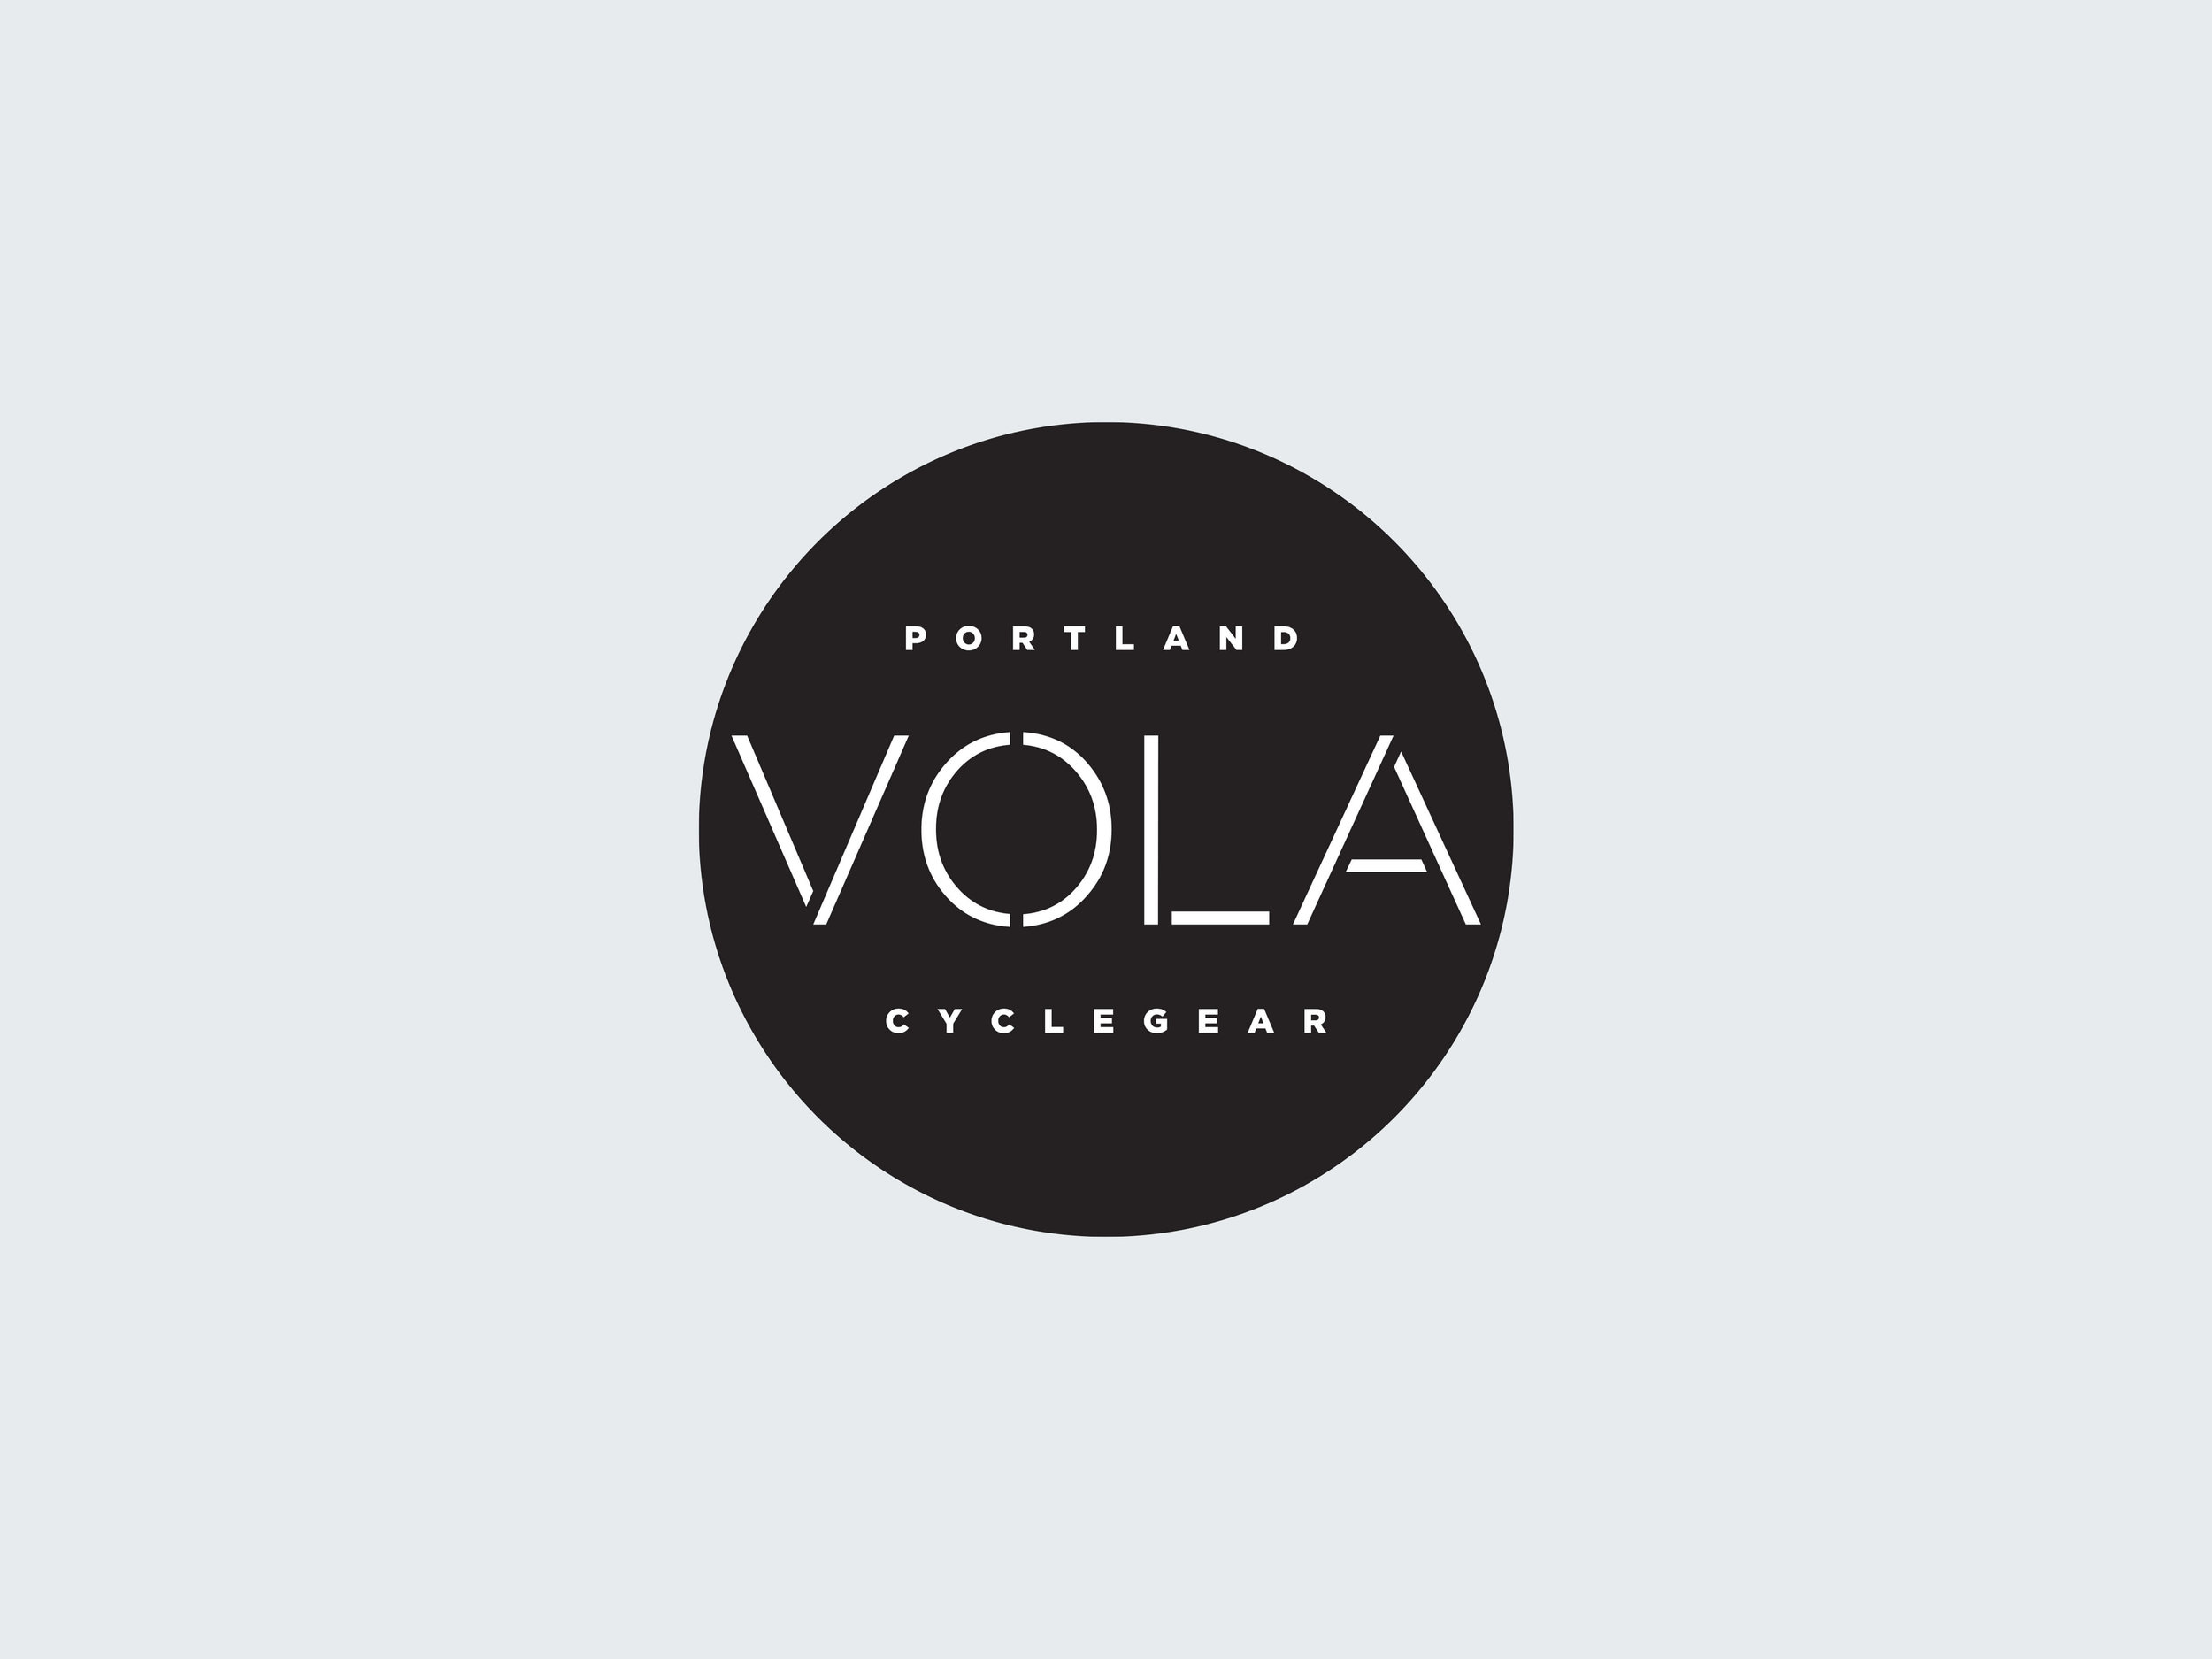 Vola-cyclegear.jpg